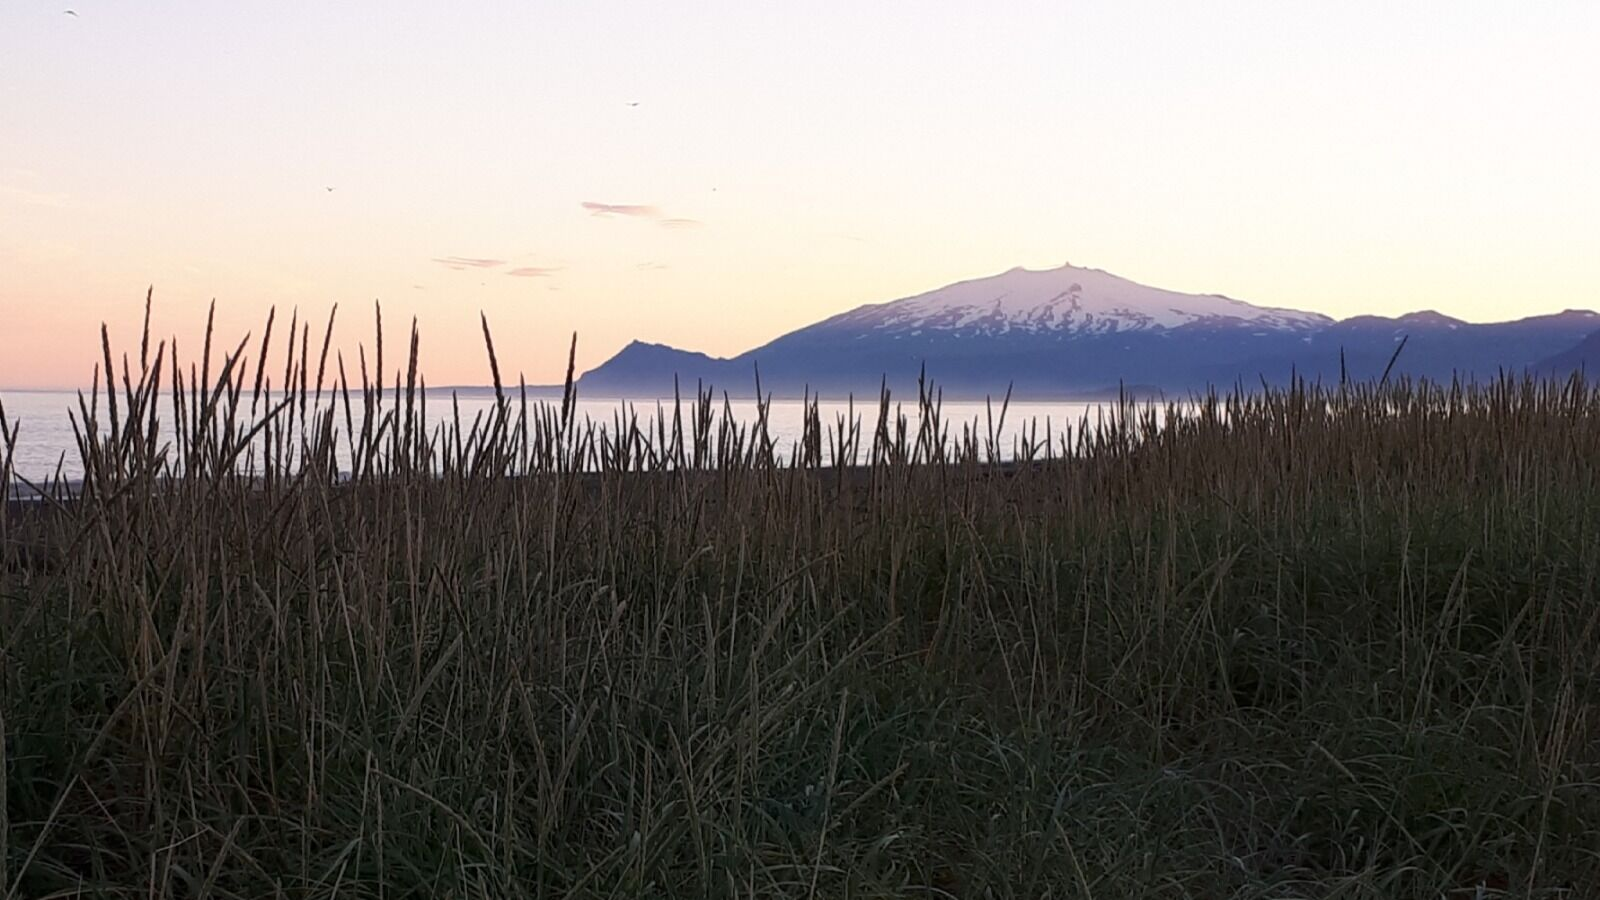 The Matriarch of the West - Snæfellsjökull, Iceland